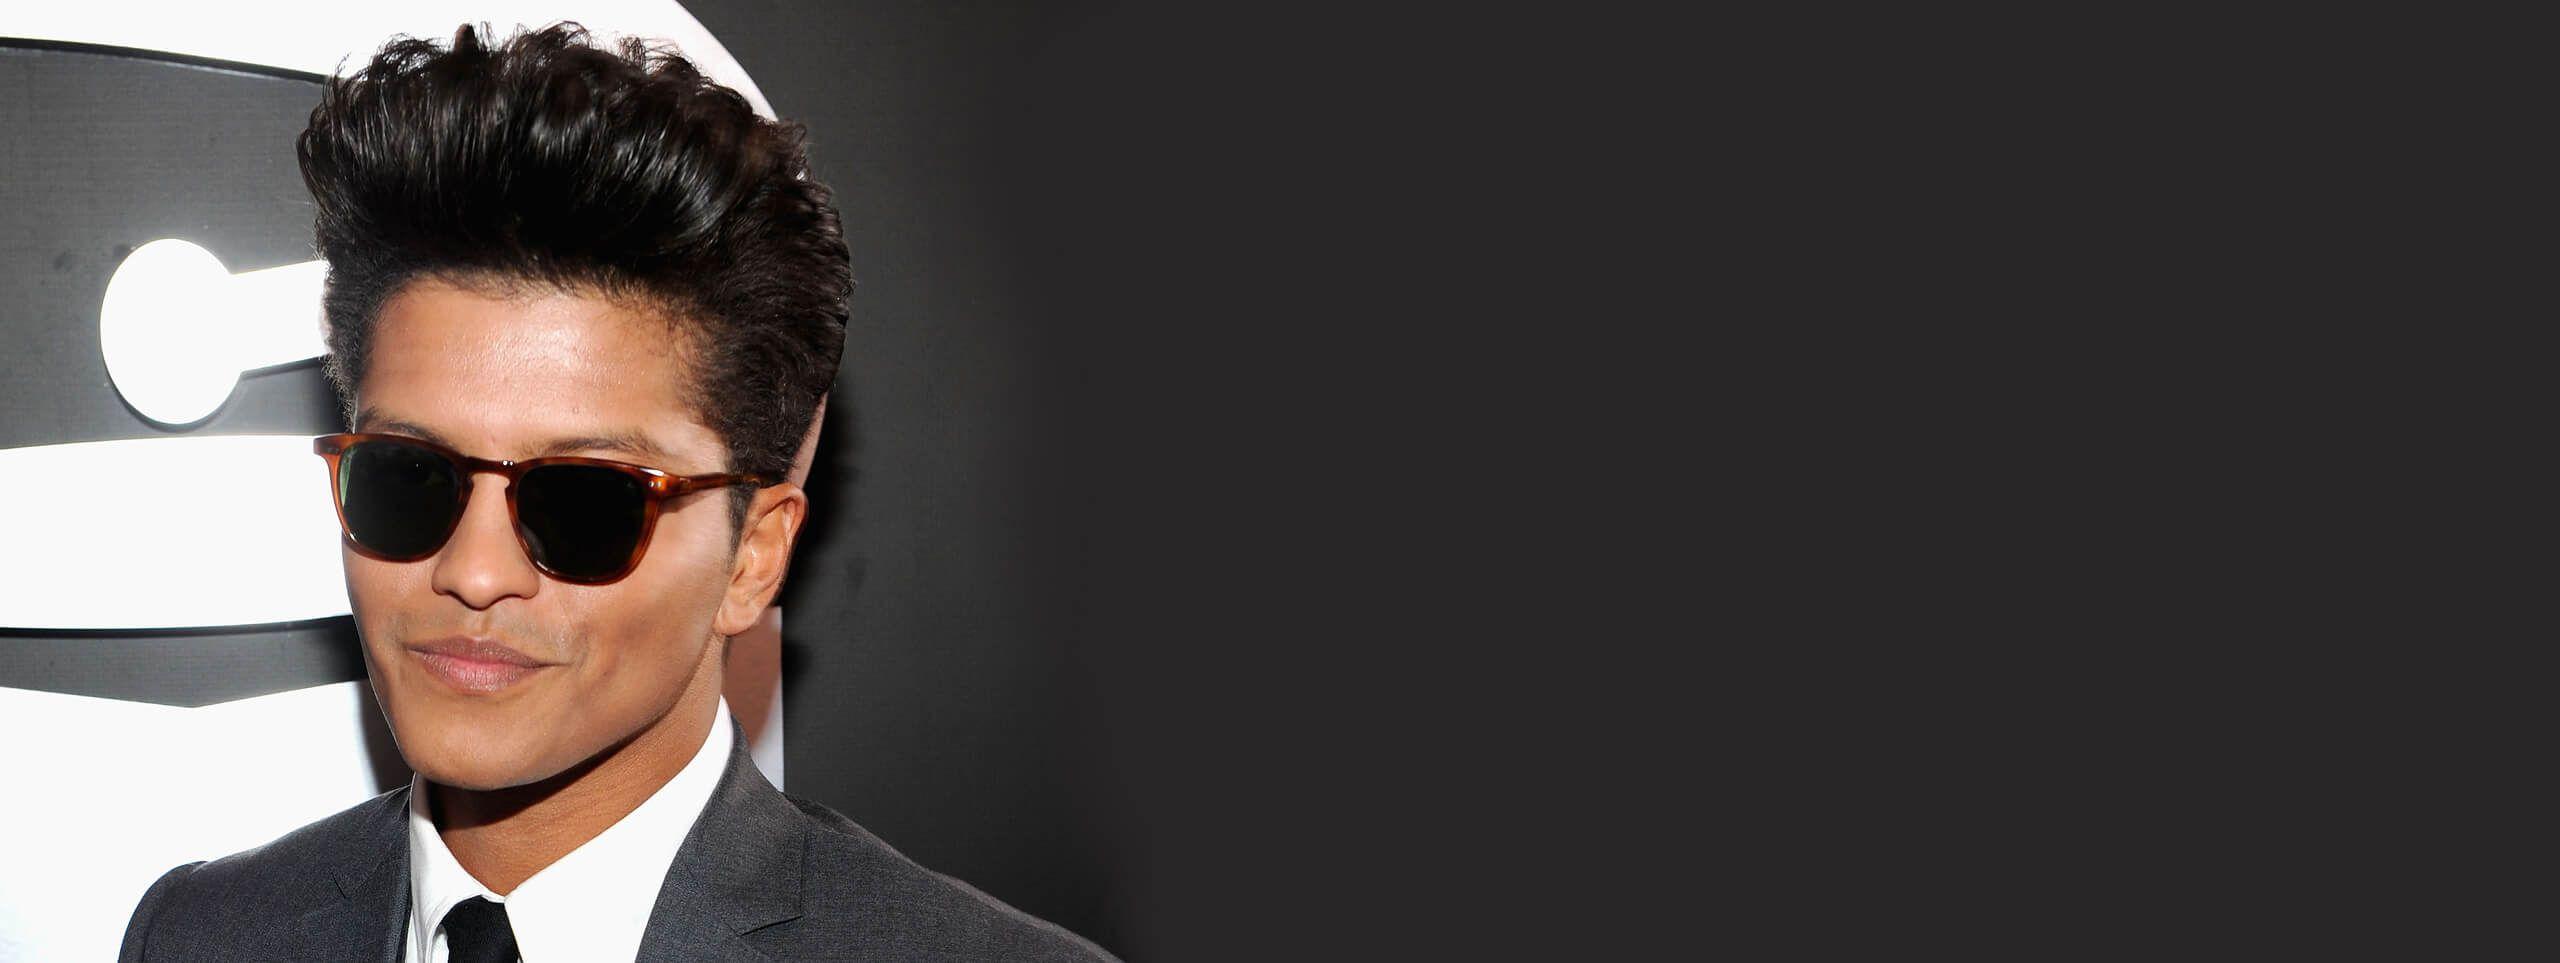 Bruno Mars coupe Pompadour